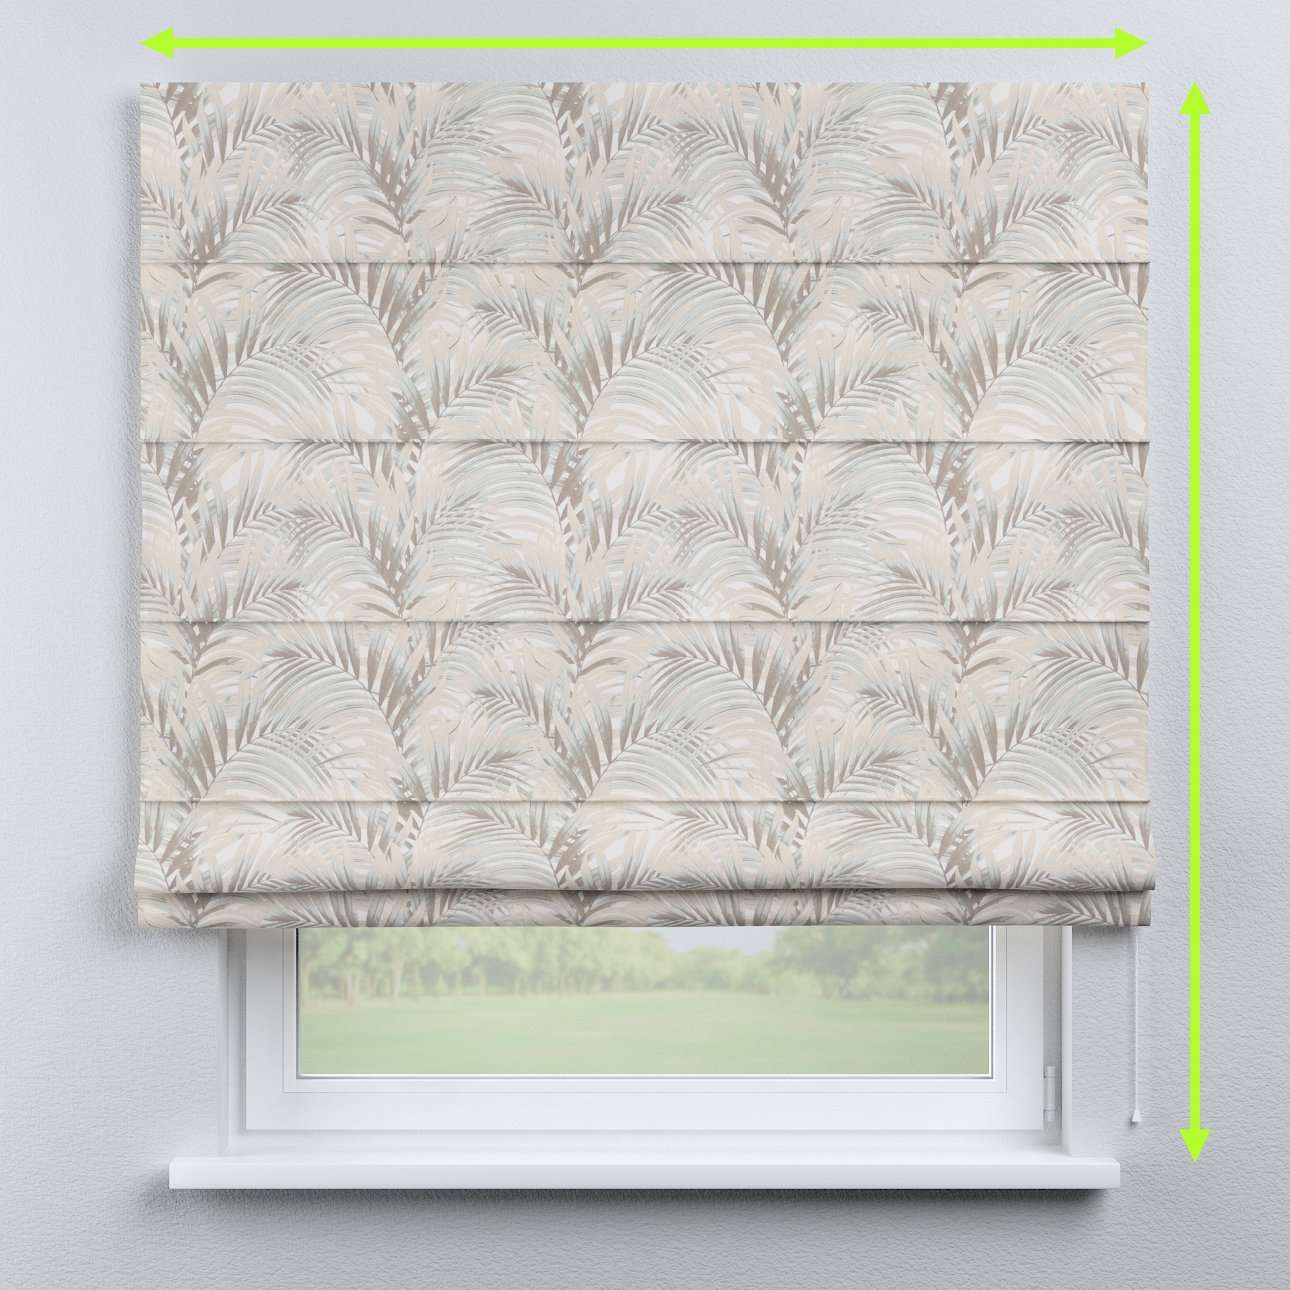 Capri roman blind in collection Gardenia, fabric: 142-14